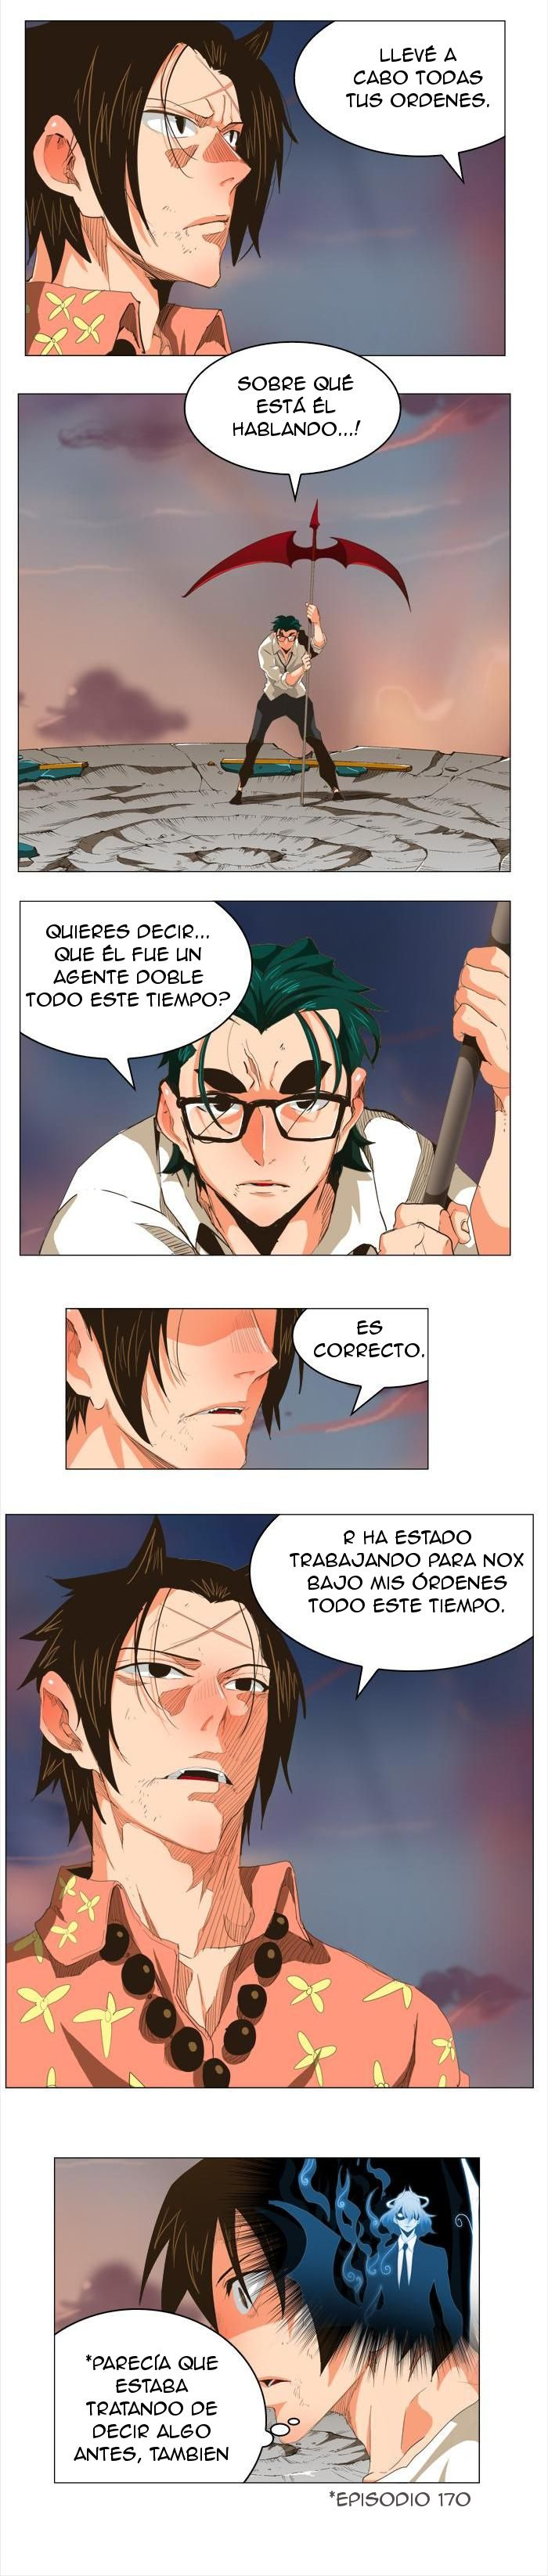 http://c5.ninemanga.com/es_manga/37/485/487894/f6534fa336c9a3808af36dd3f81ef136.jpg Page 3